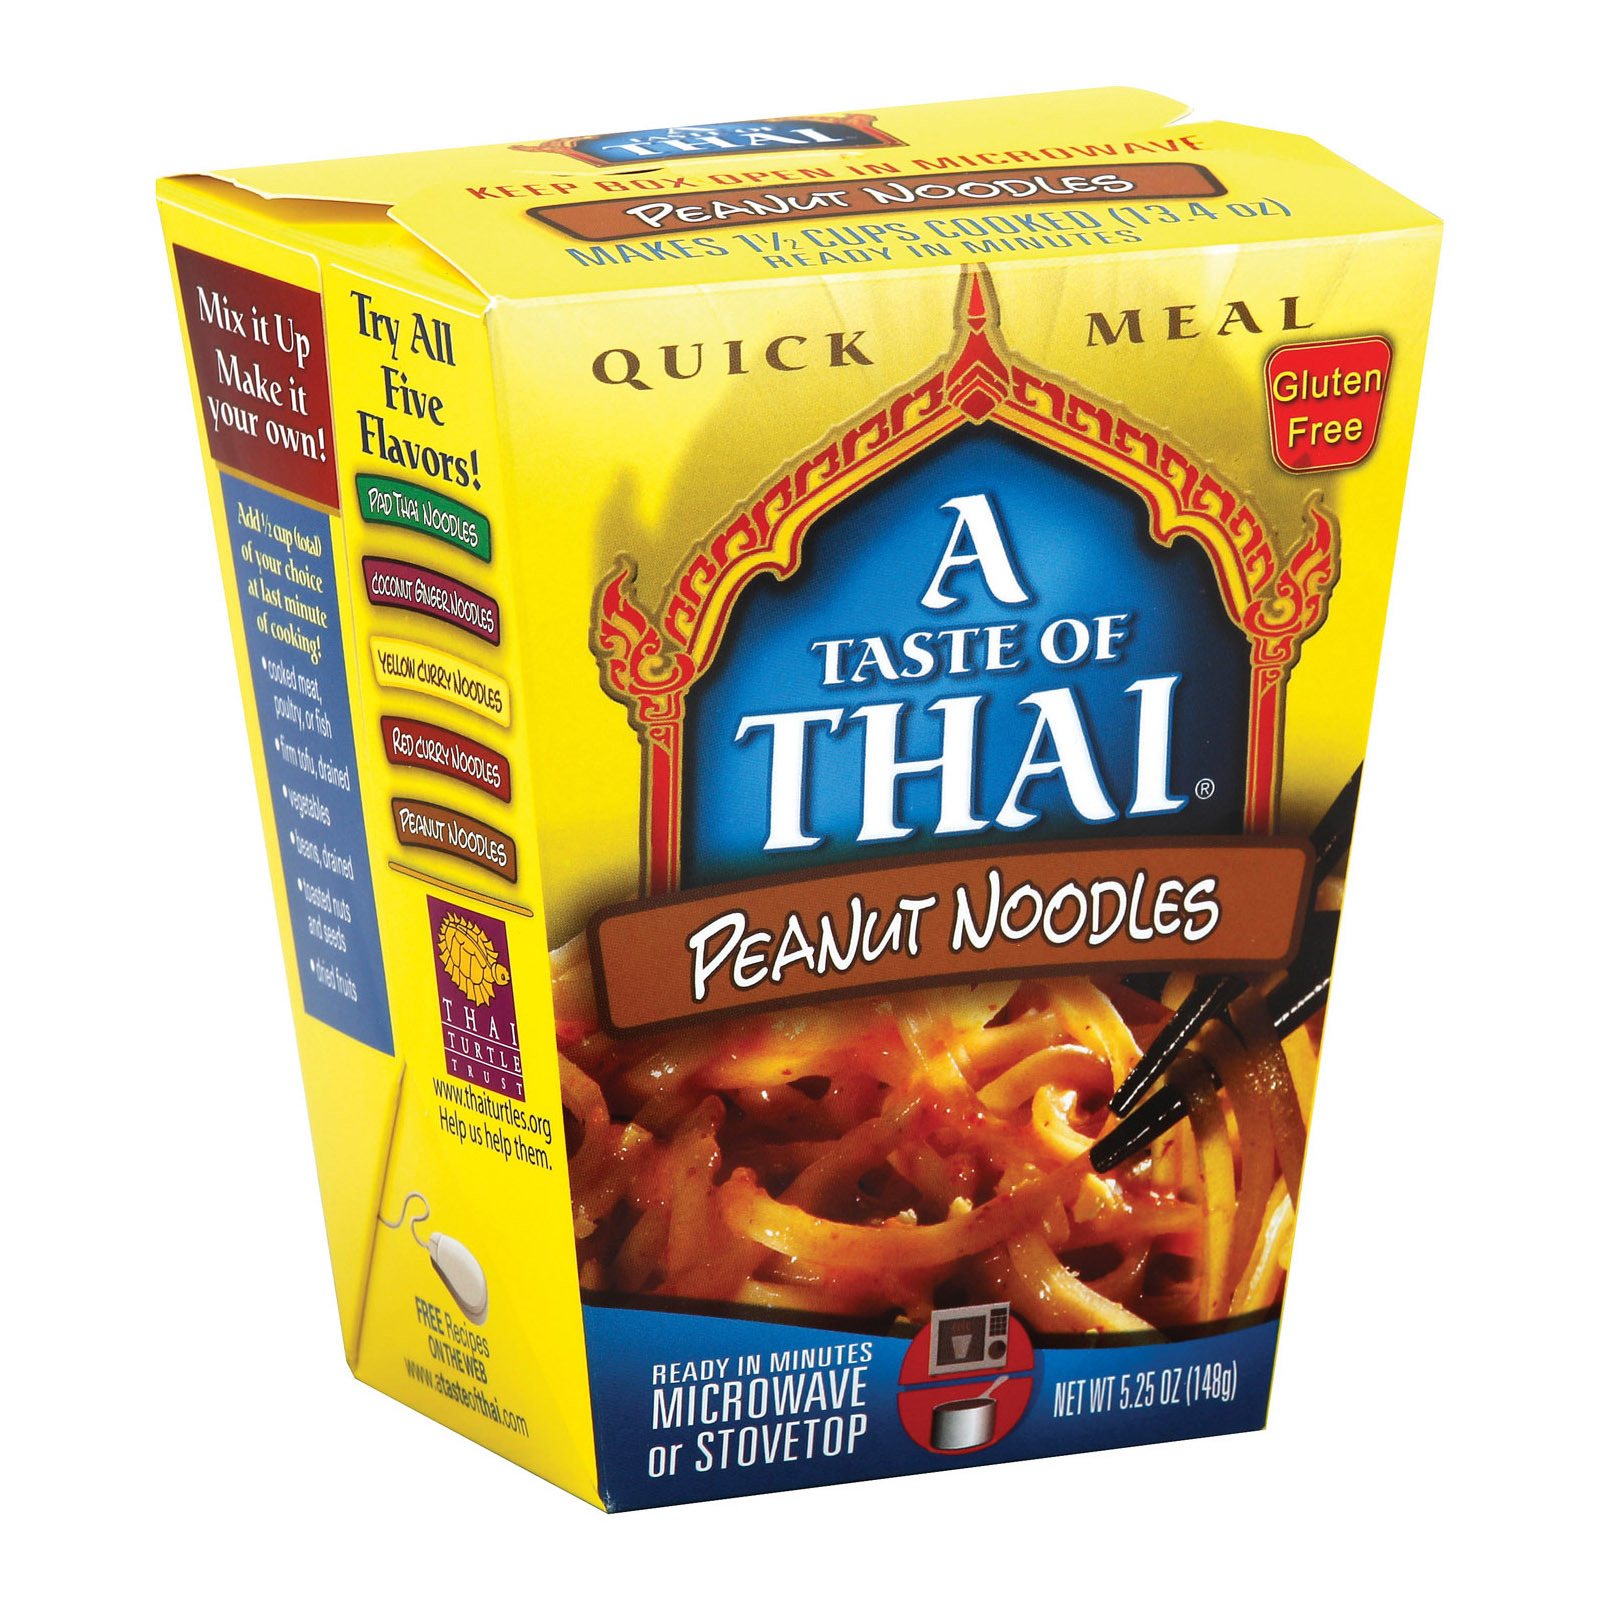 Taste of Thai Peanut Noodles Quick Meal - Case of 6 - 5.25 oz.